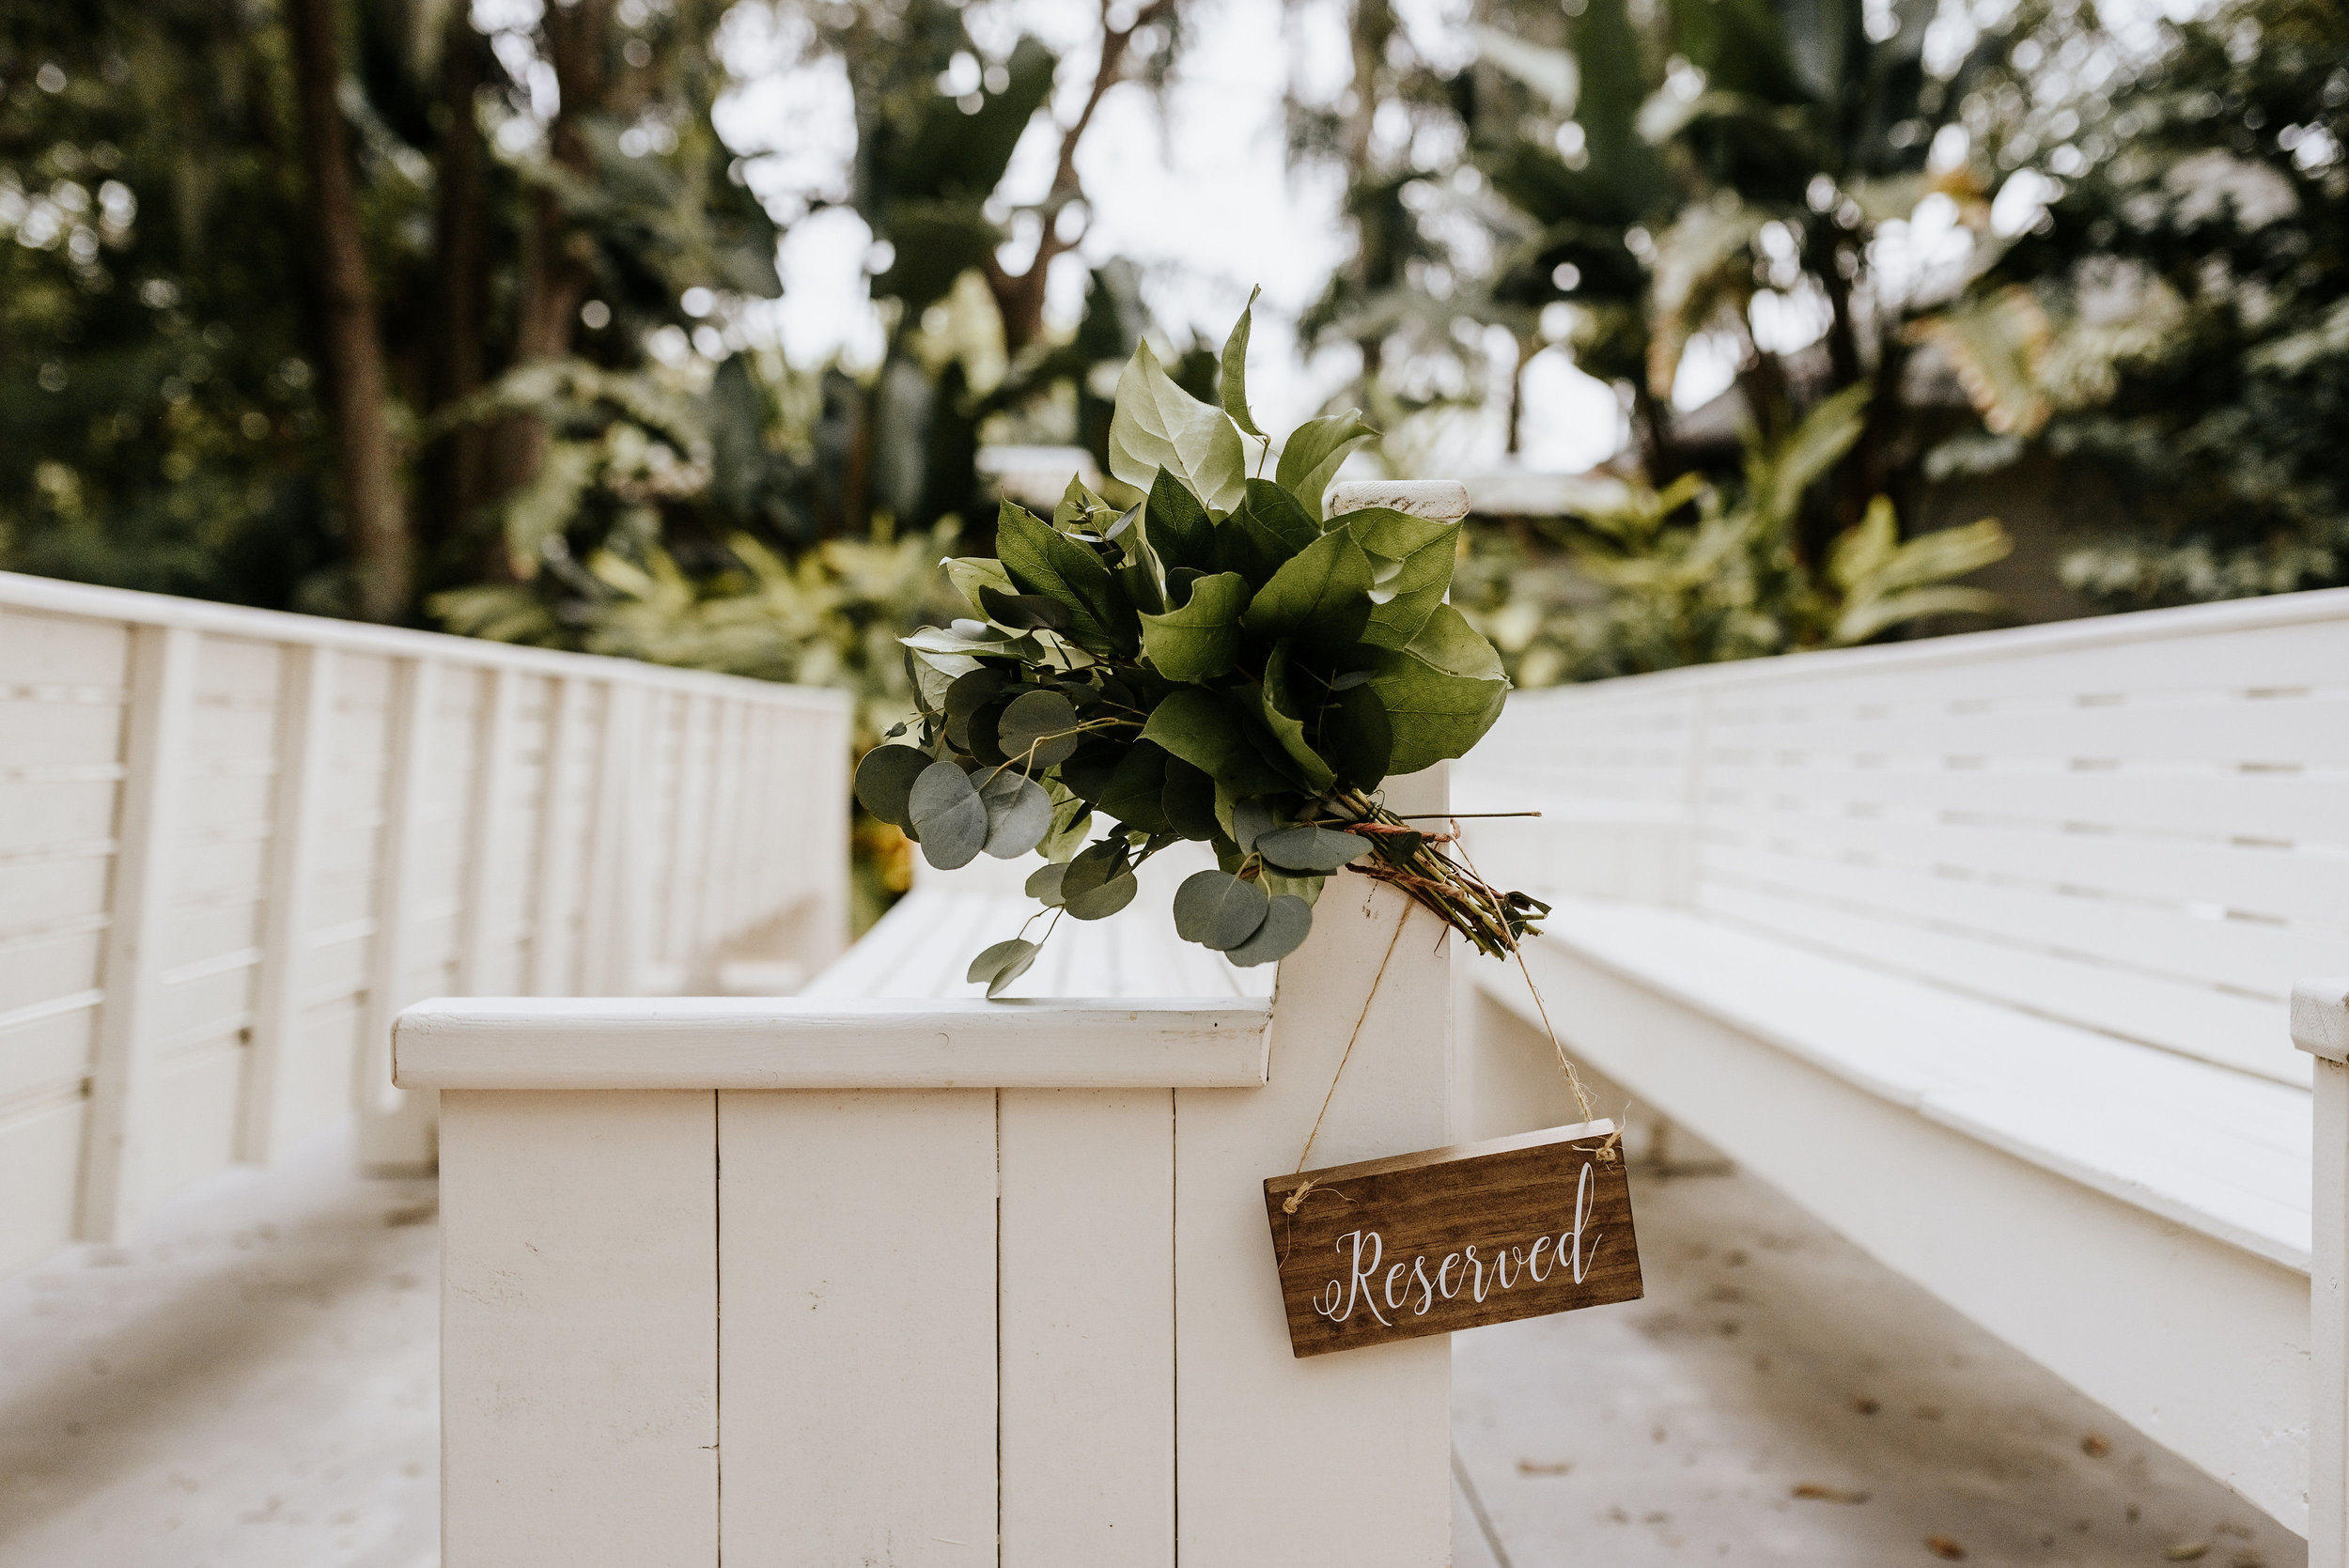 Mikenzi_Brad_Wedding_The_Delamater_House_New_Smyrna_Beach_Florida_Photography_by_V_0717.jpg